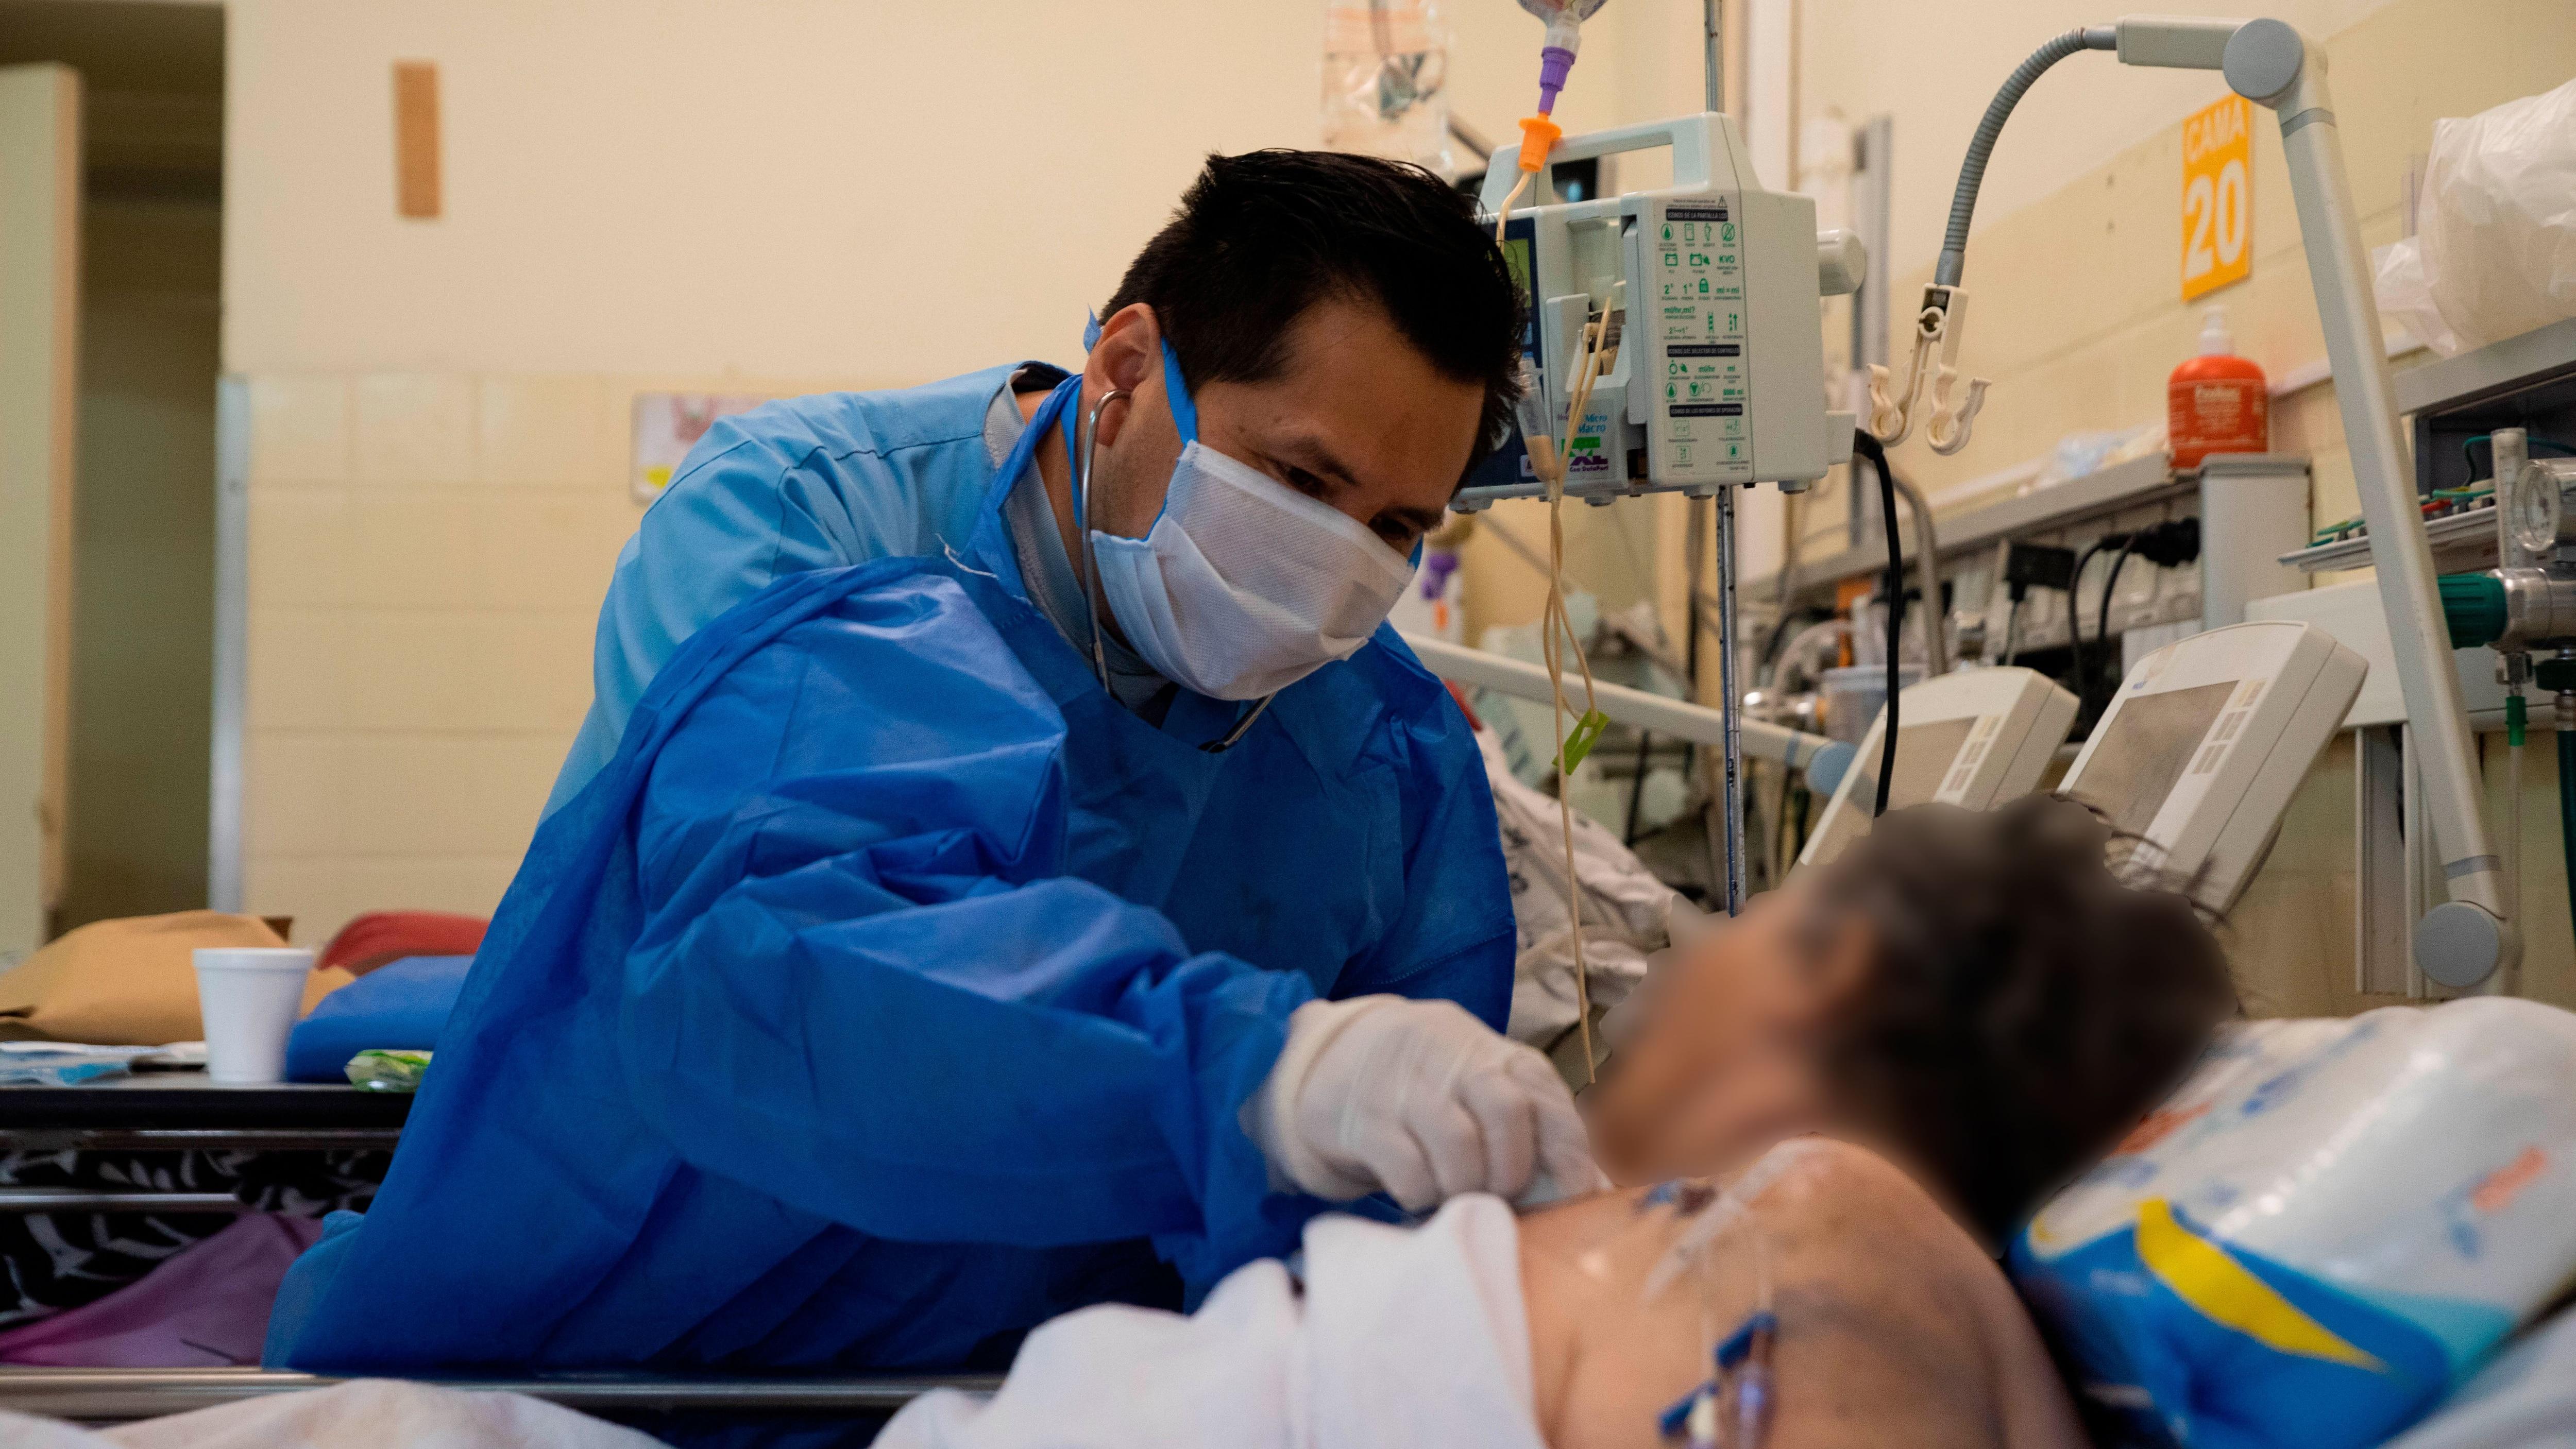 Recorrida Hospital Posadas - COVID 19 - Coronavirus